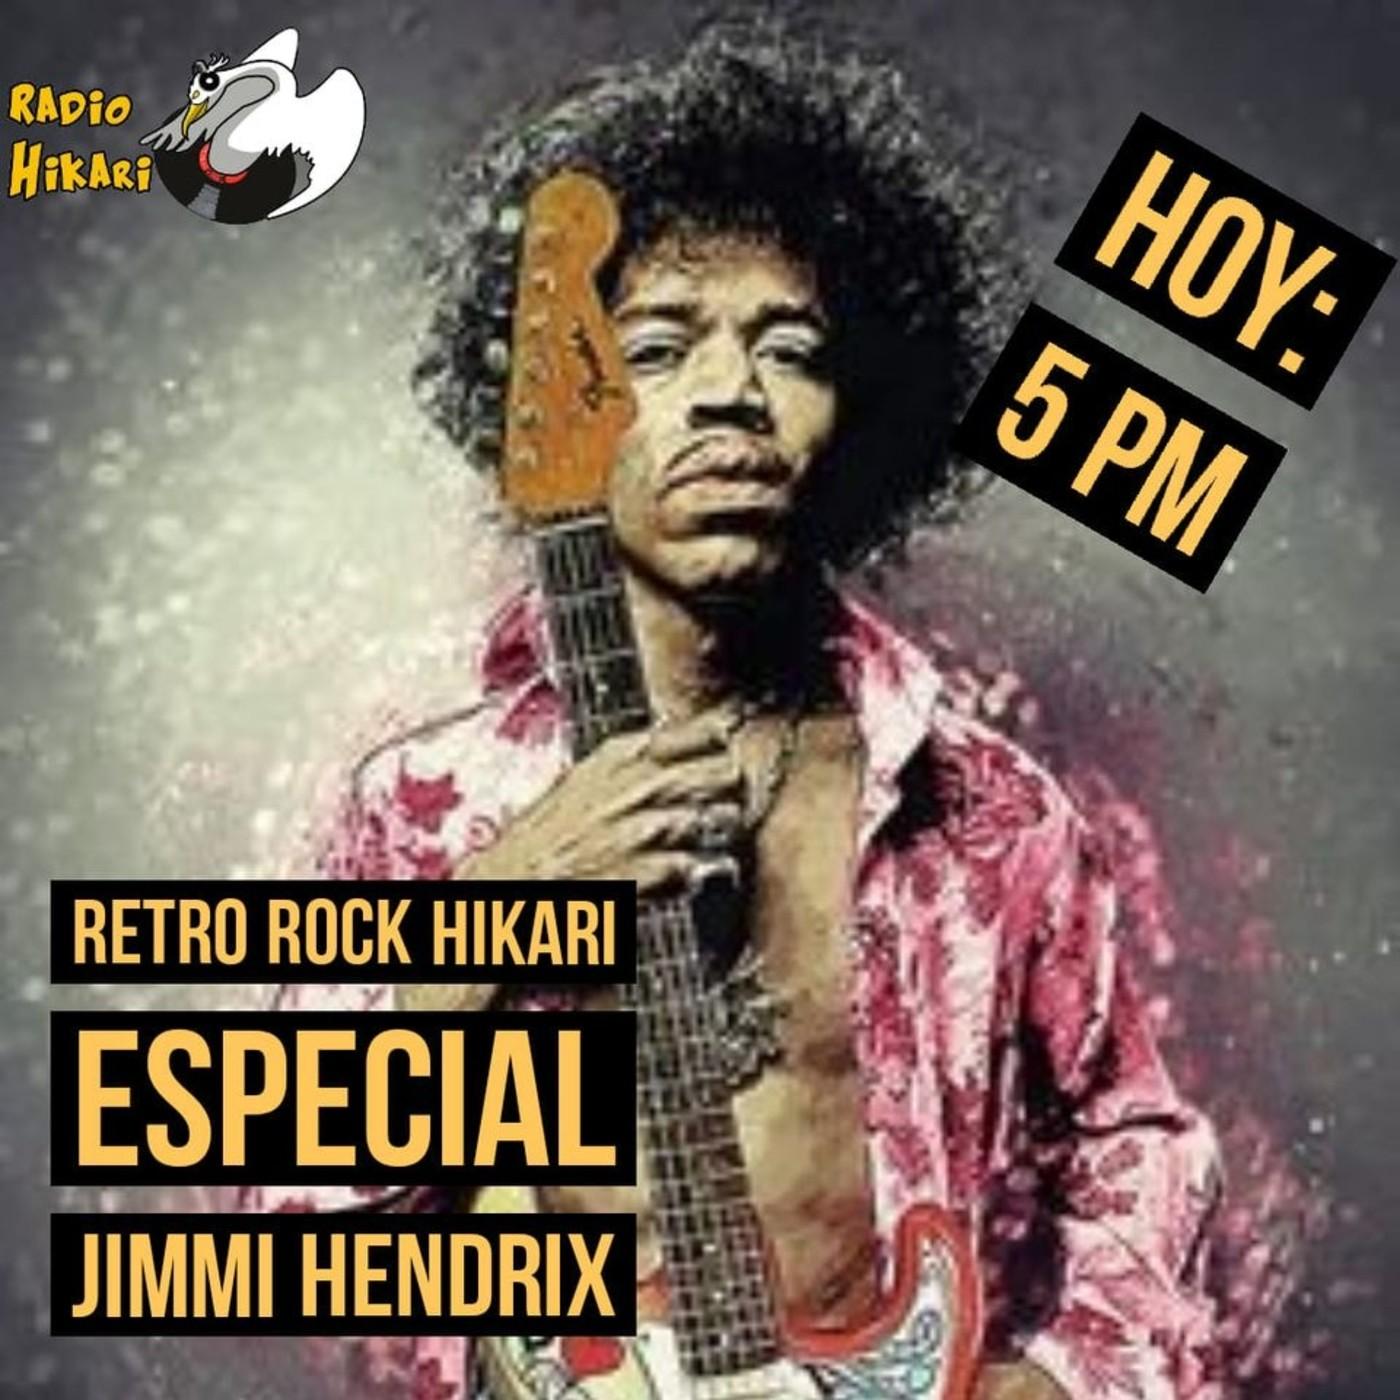 Retro Rock Hikari: Especial Jimmy Hendrix